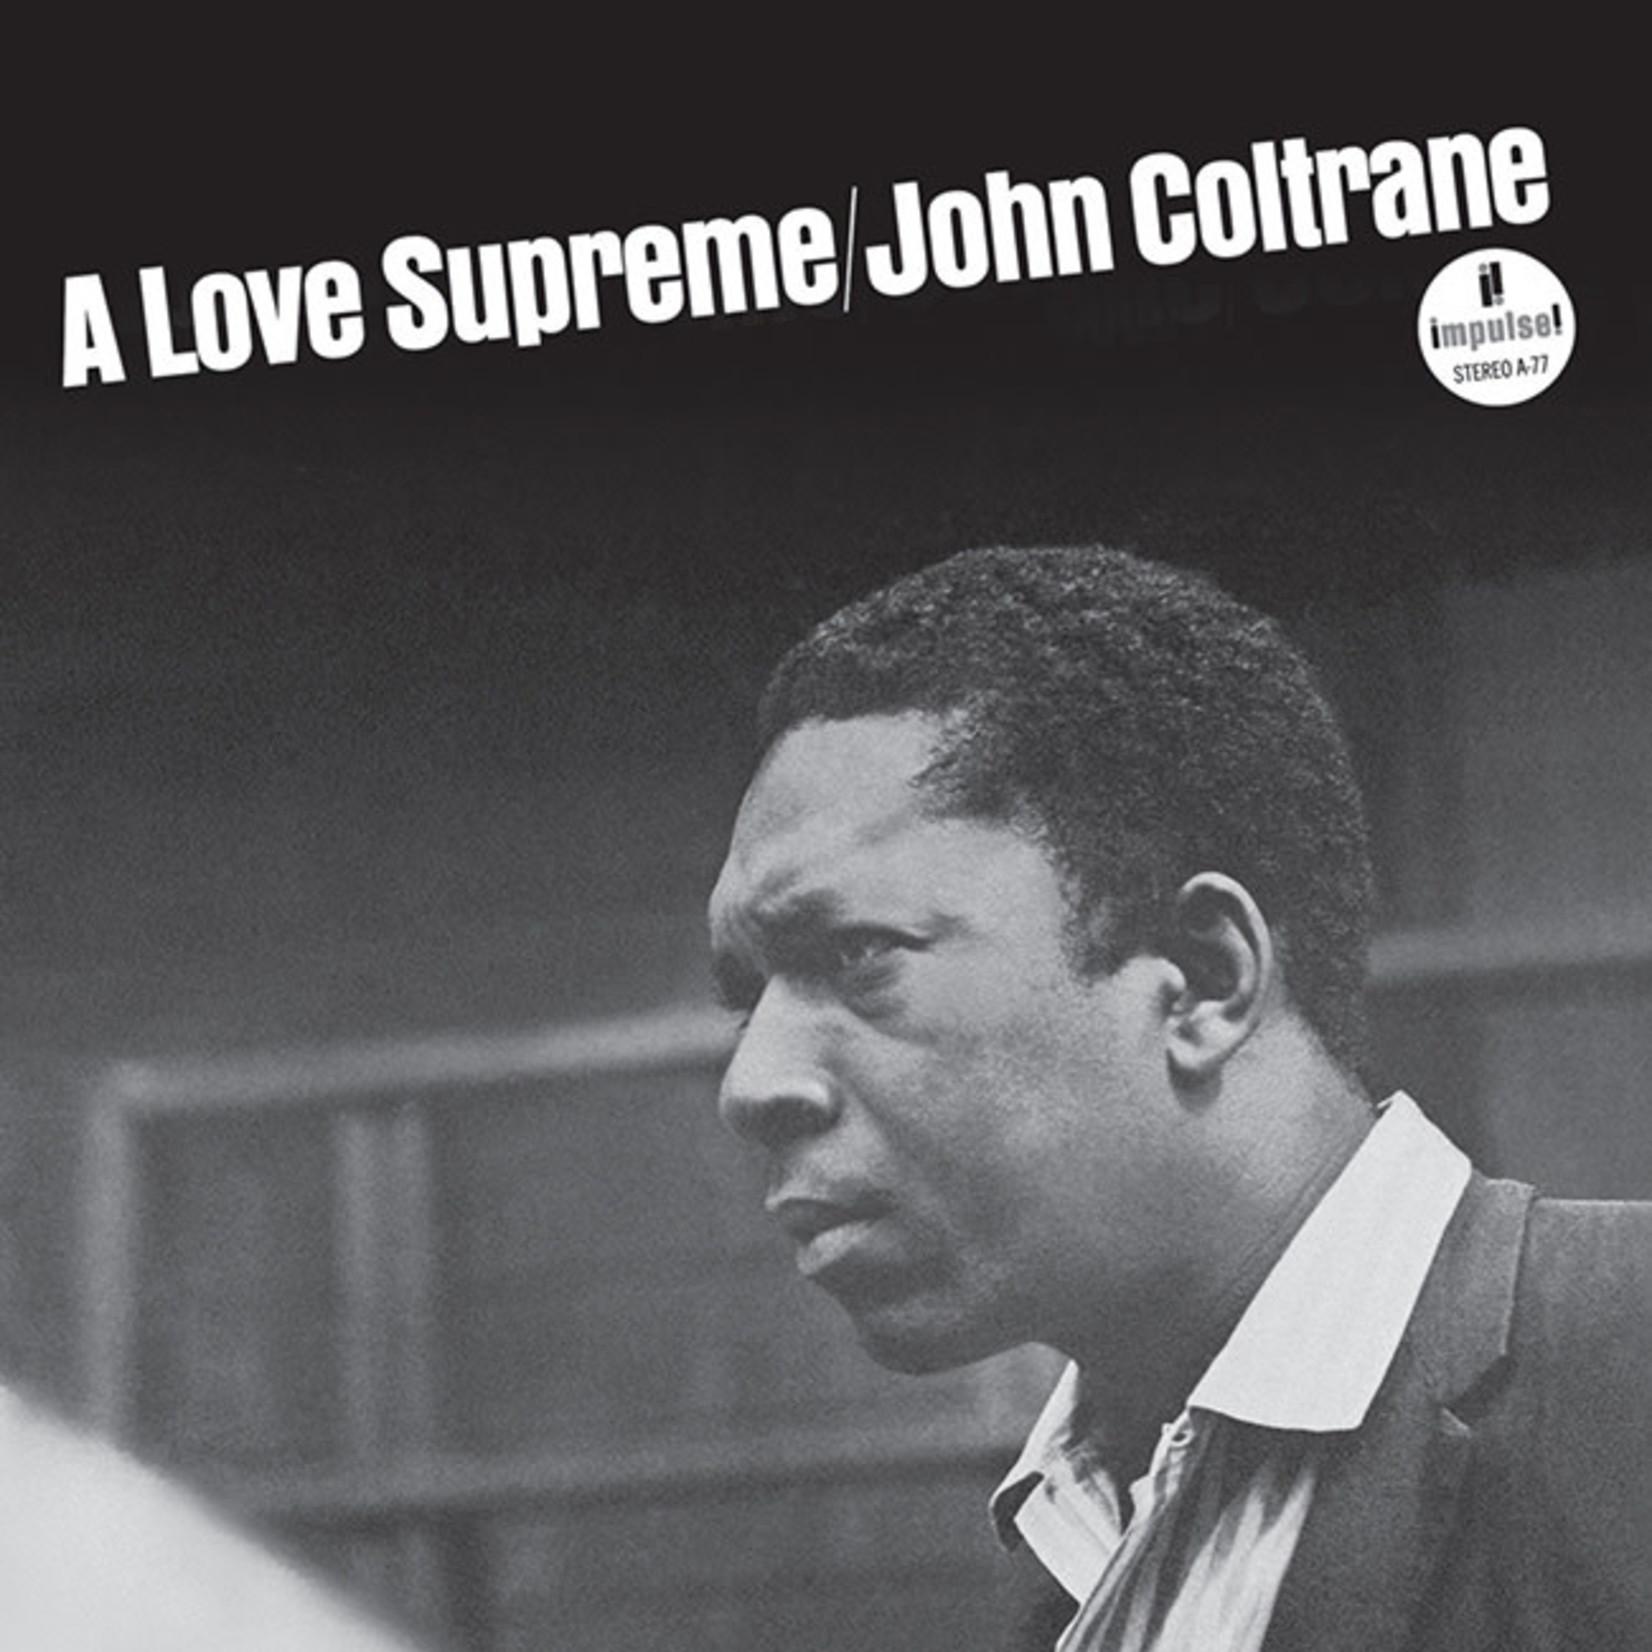 [New] Coltrane, John: A Love Supreme (Acoustic Sounds Series)